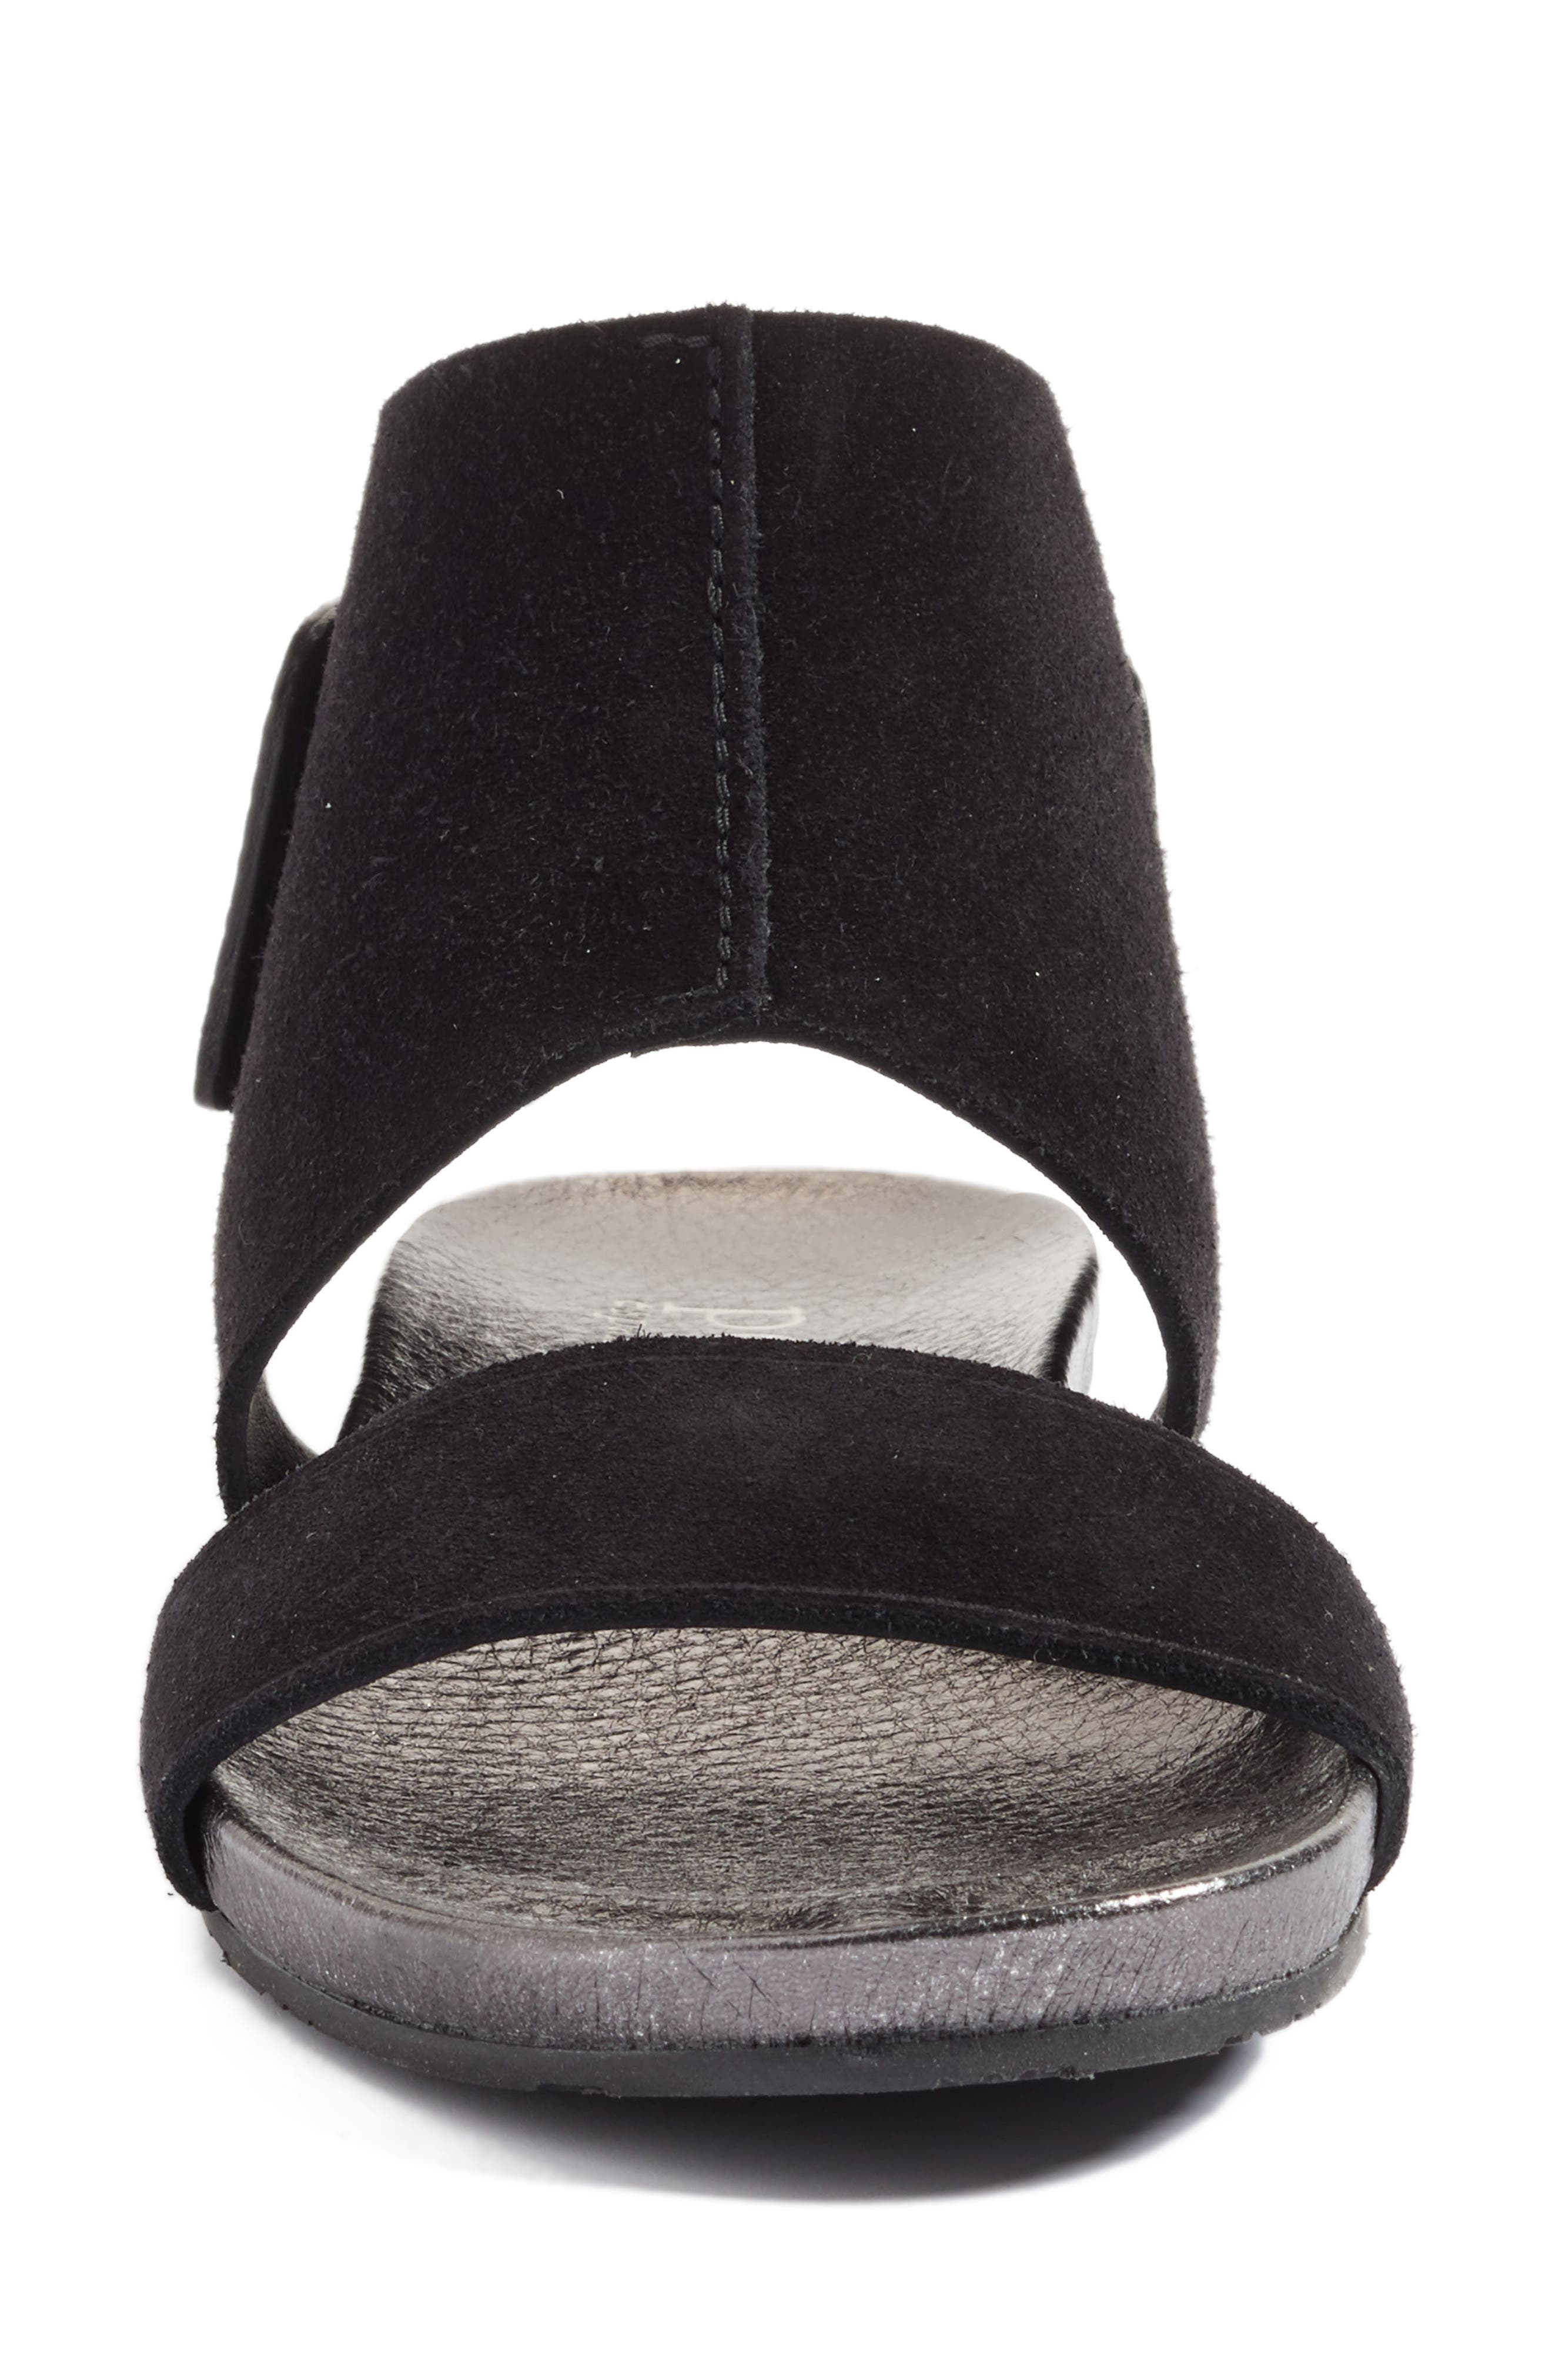 Ankle Cuff Sandal,                             Alternate thumbnail 4, color,                             001